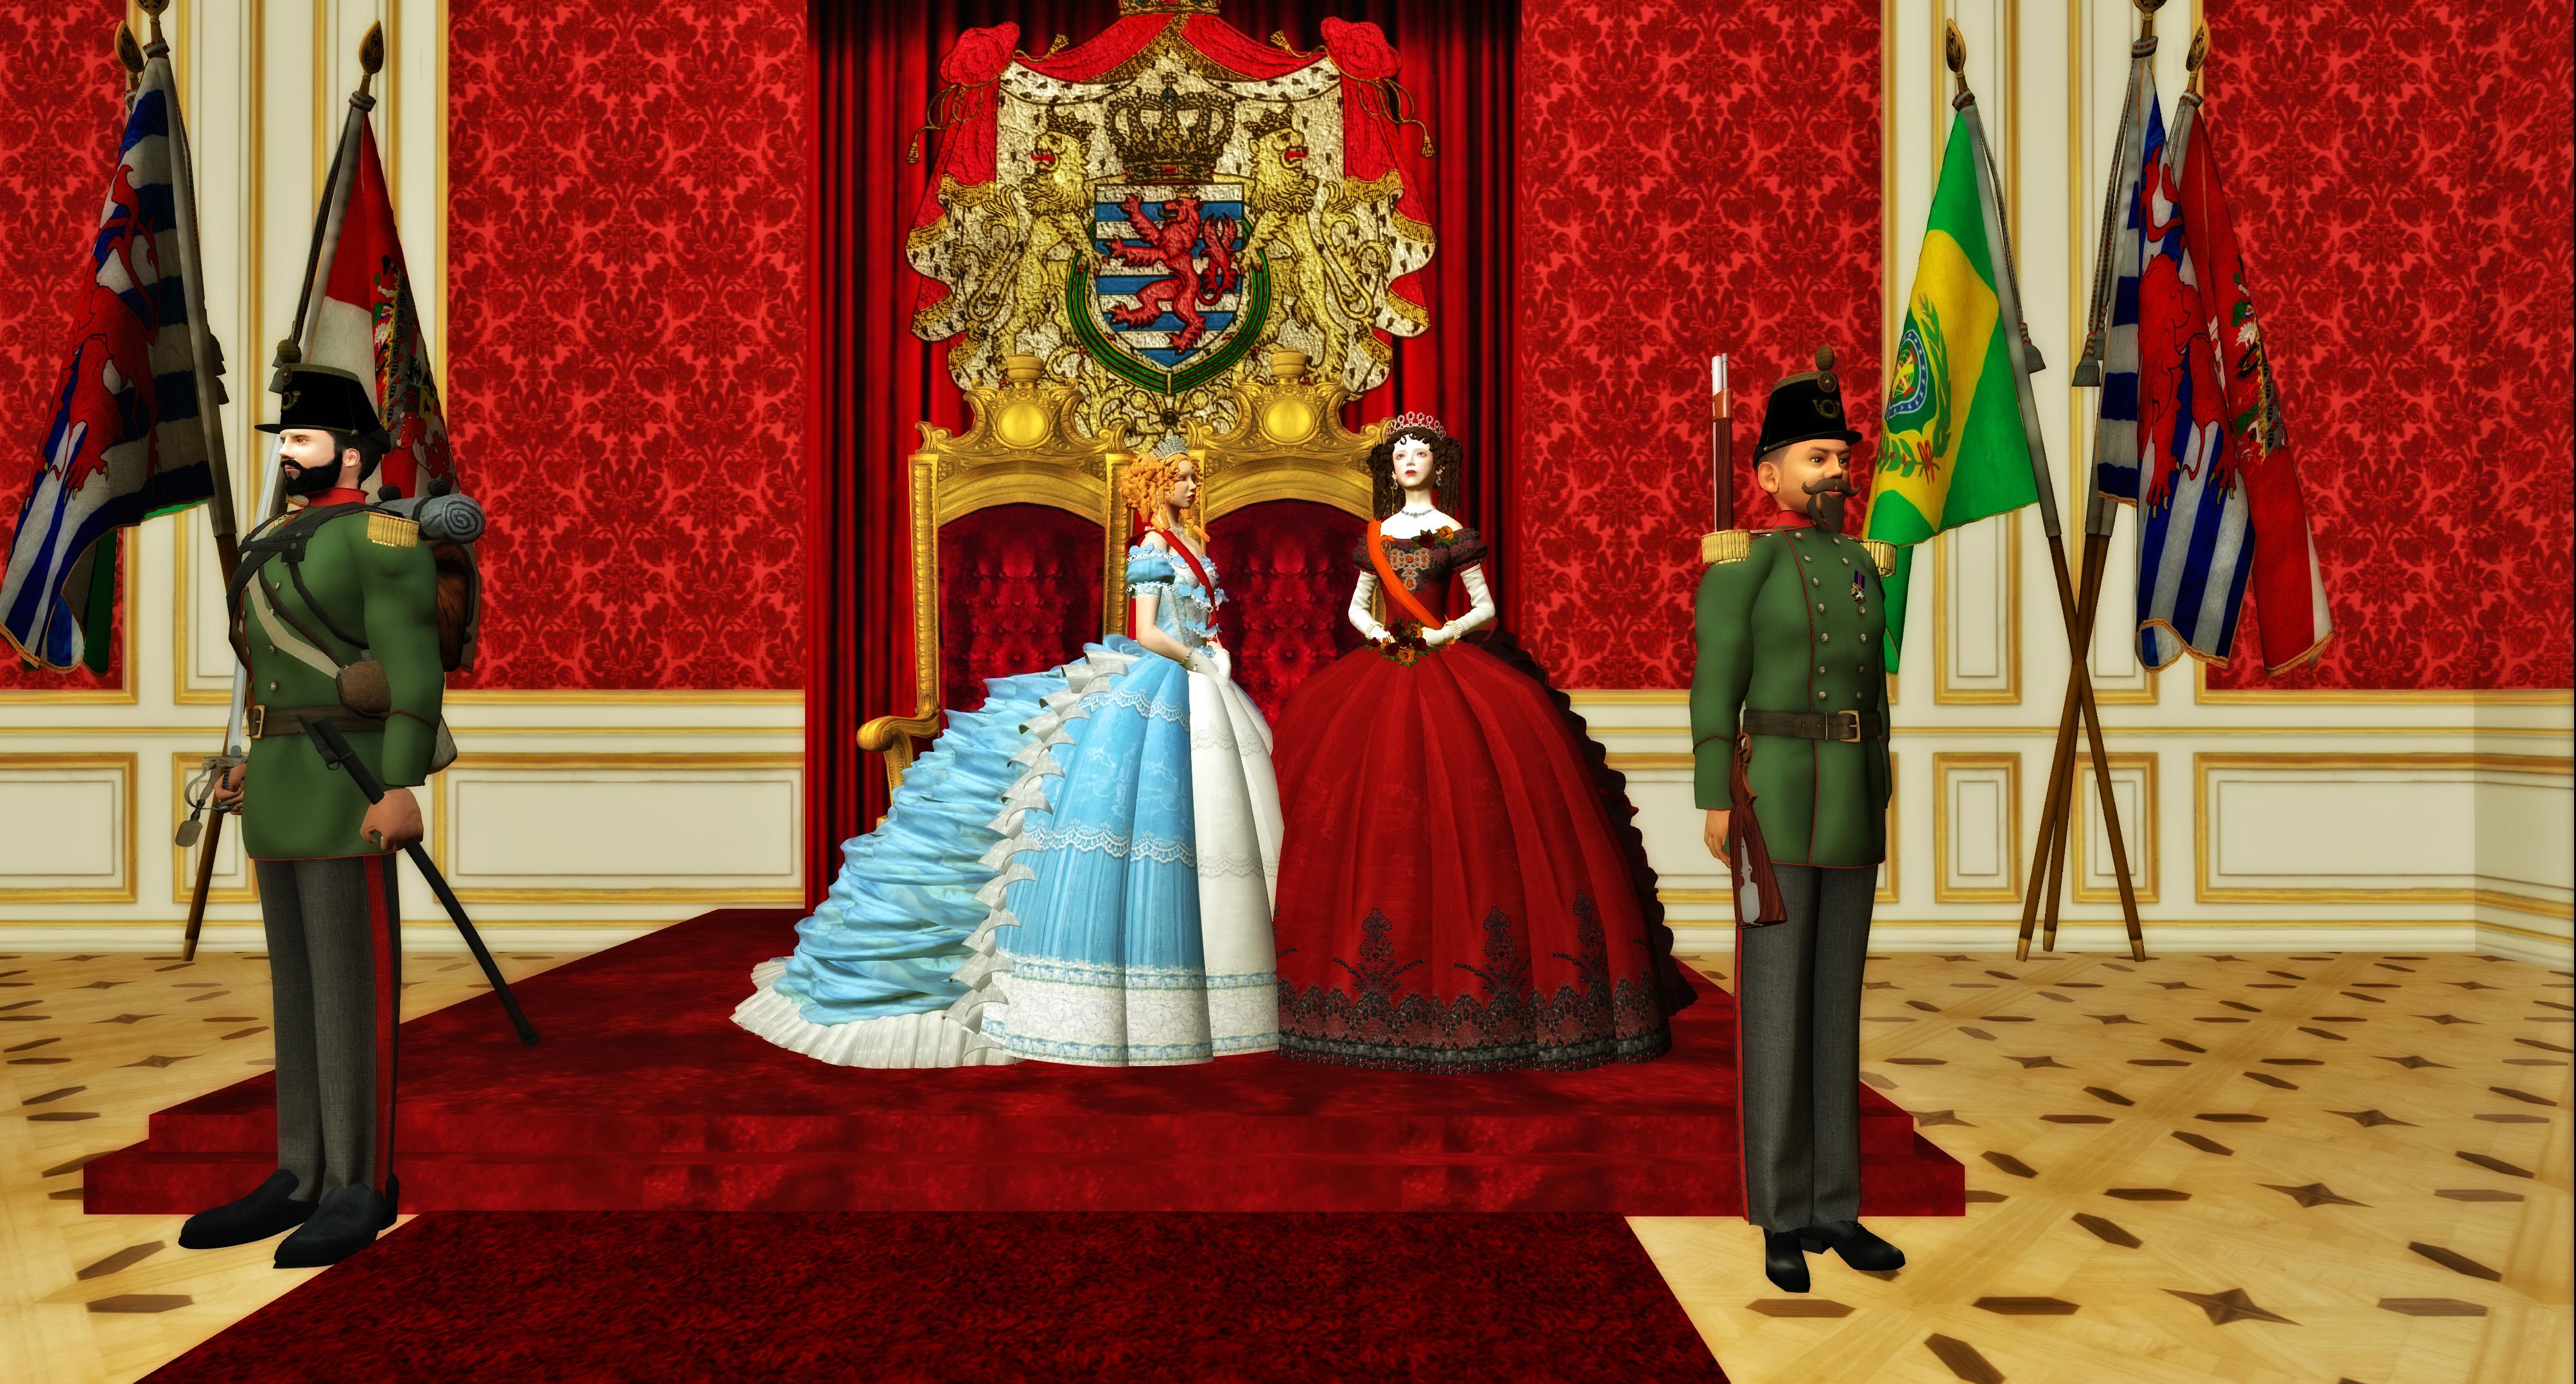 Son Altesse Sérenissime Victoire I de Brandebourg Bayreut, Her Serene Highness Victore-Albertine de Lyan und Sa Majeste Sophie de Wurtemberg, Angélique de Fontanges